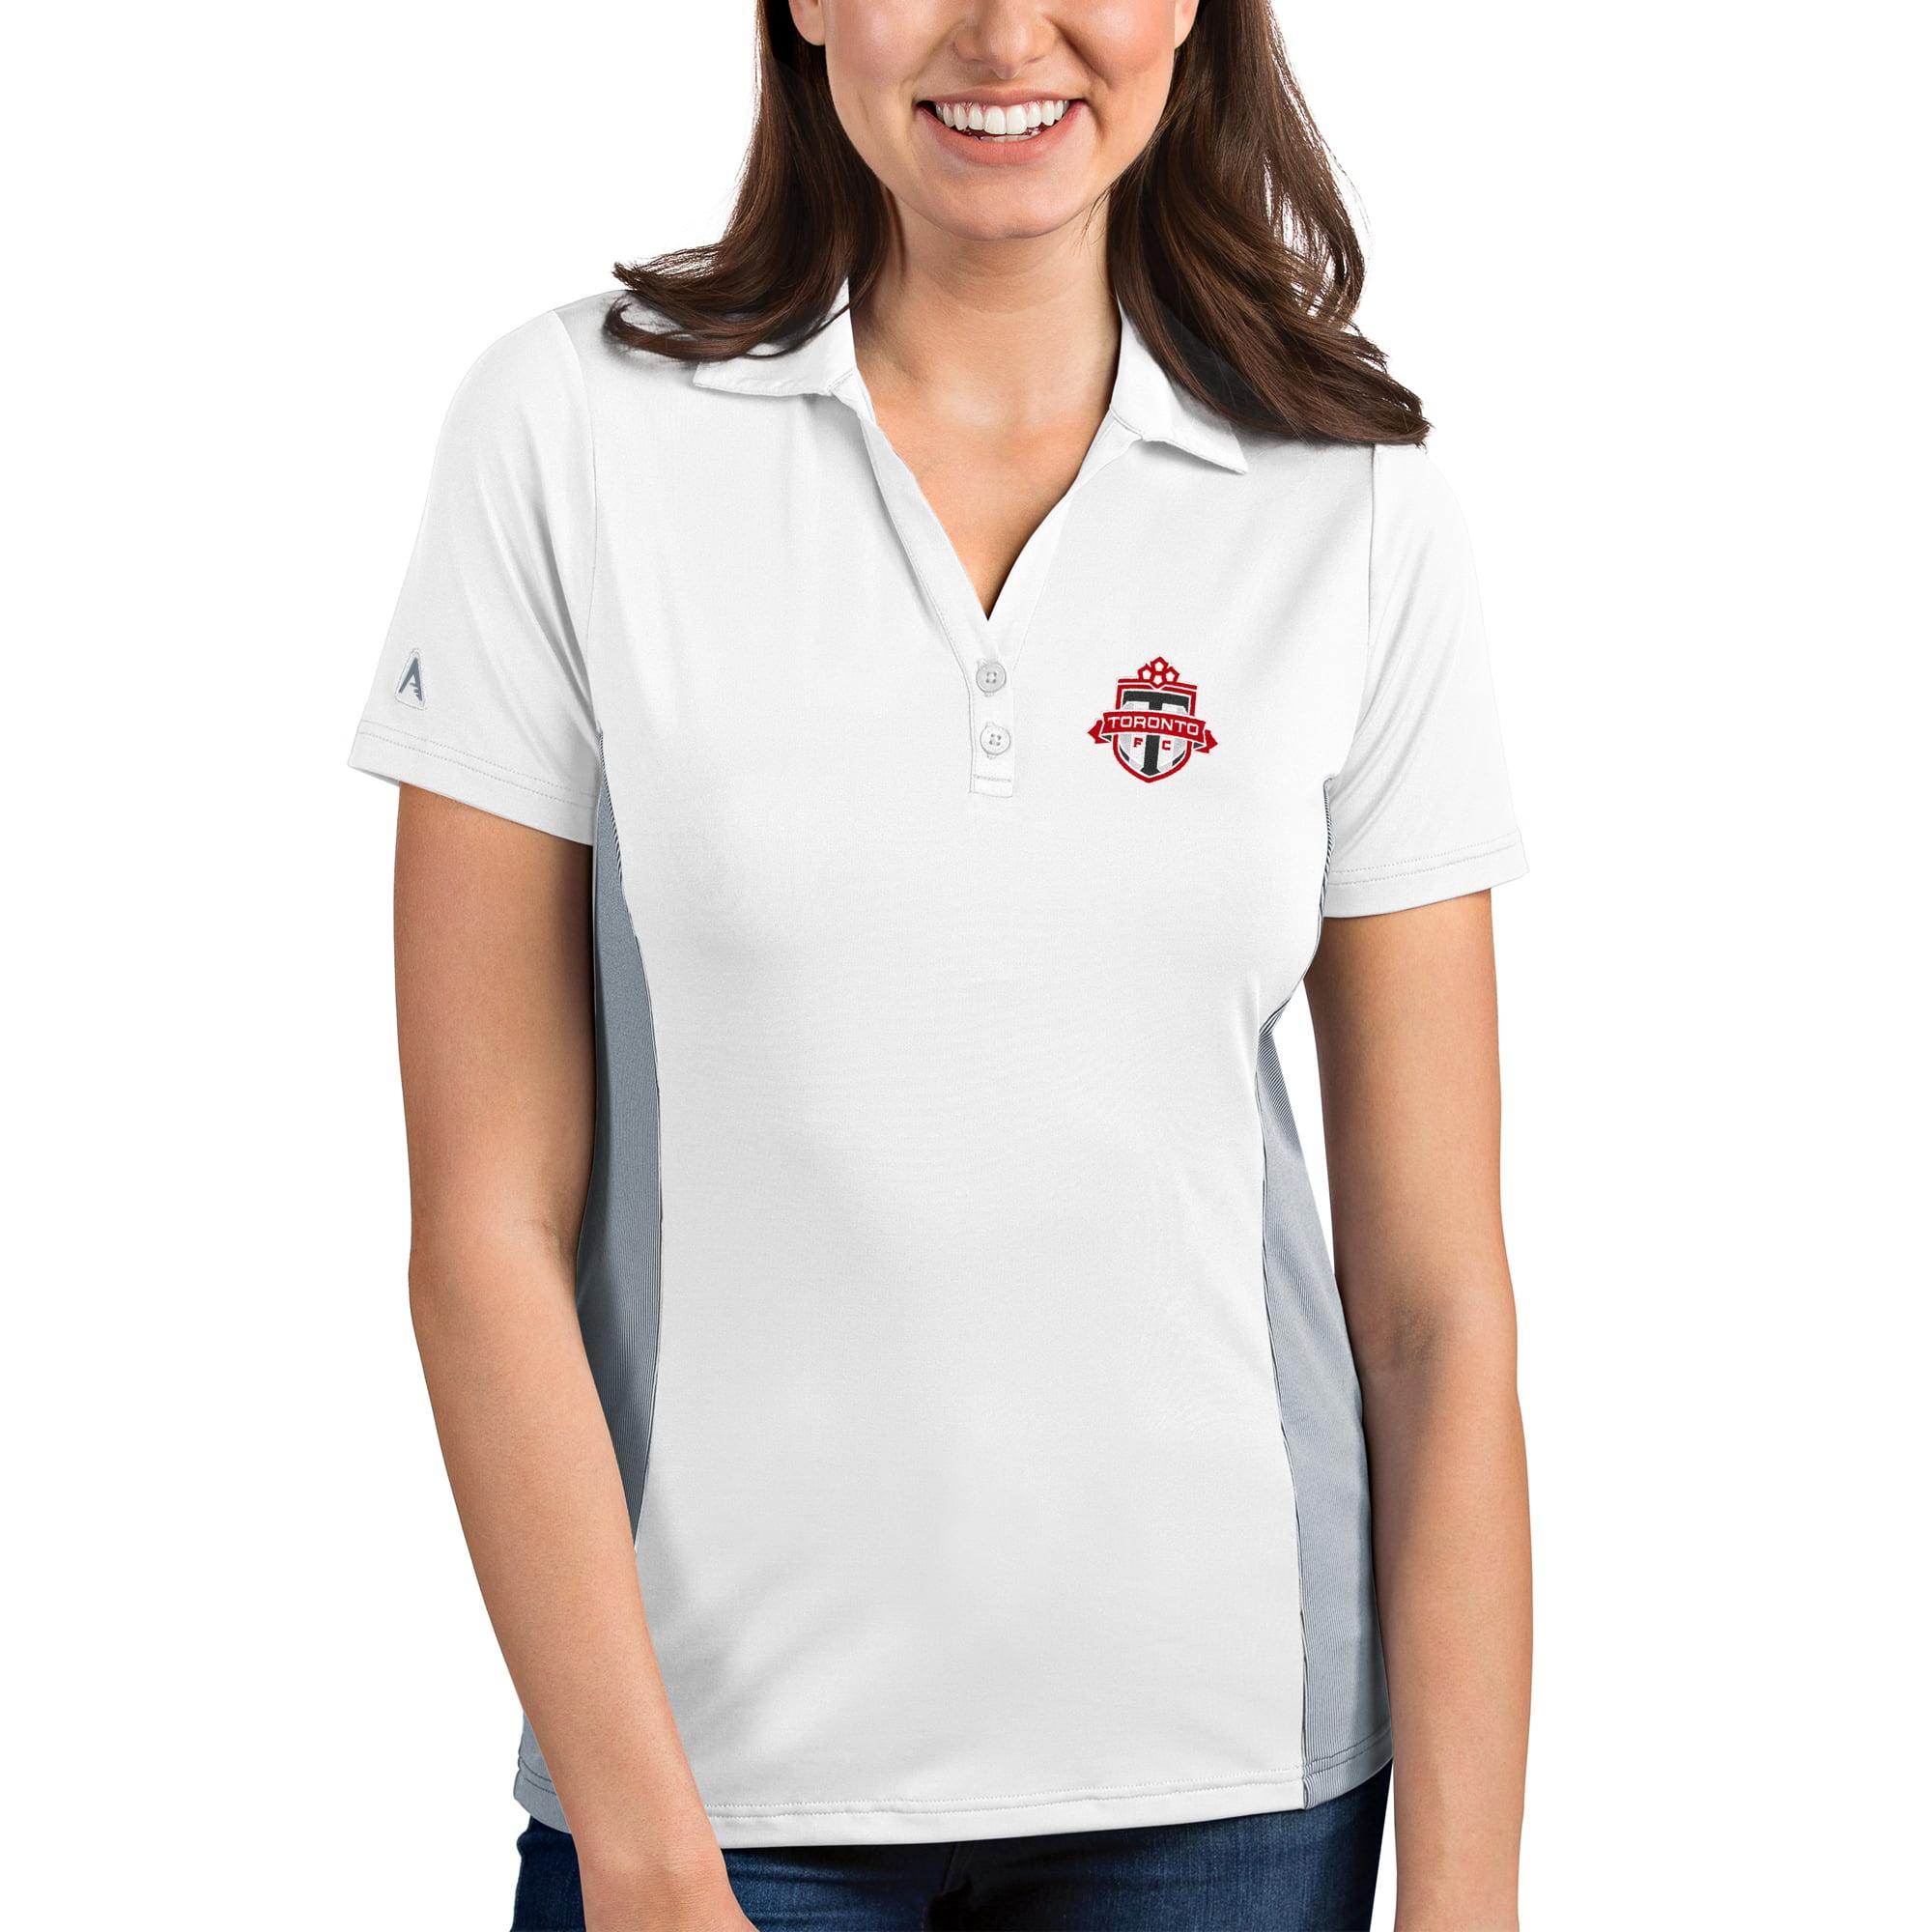 Toronto FC Antigua Women's Venture Polo - White/Steel